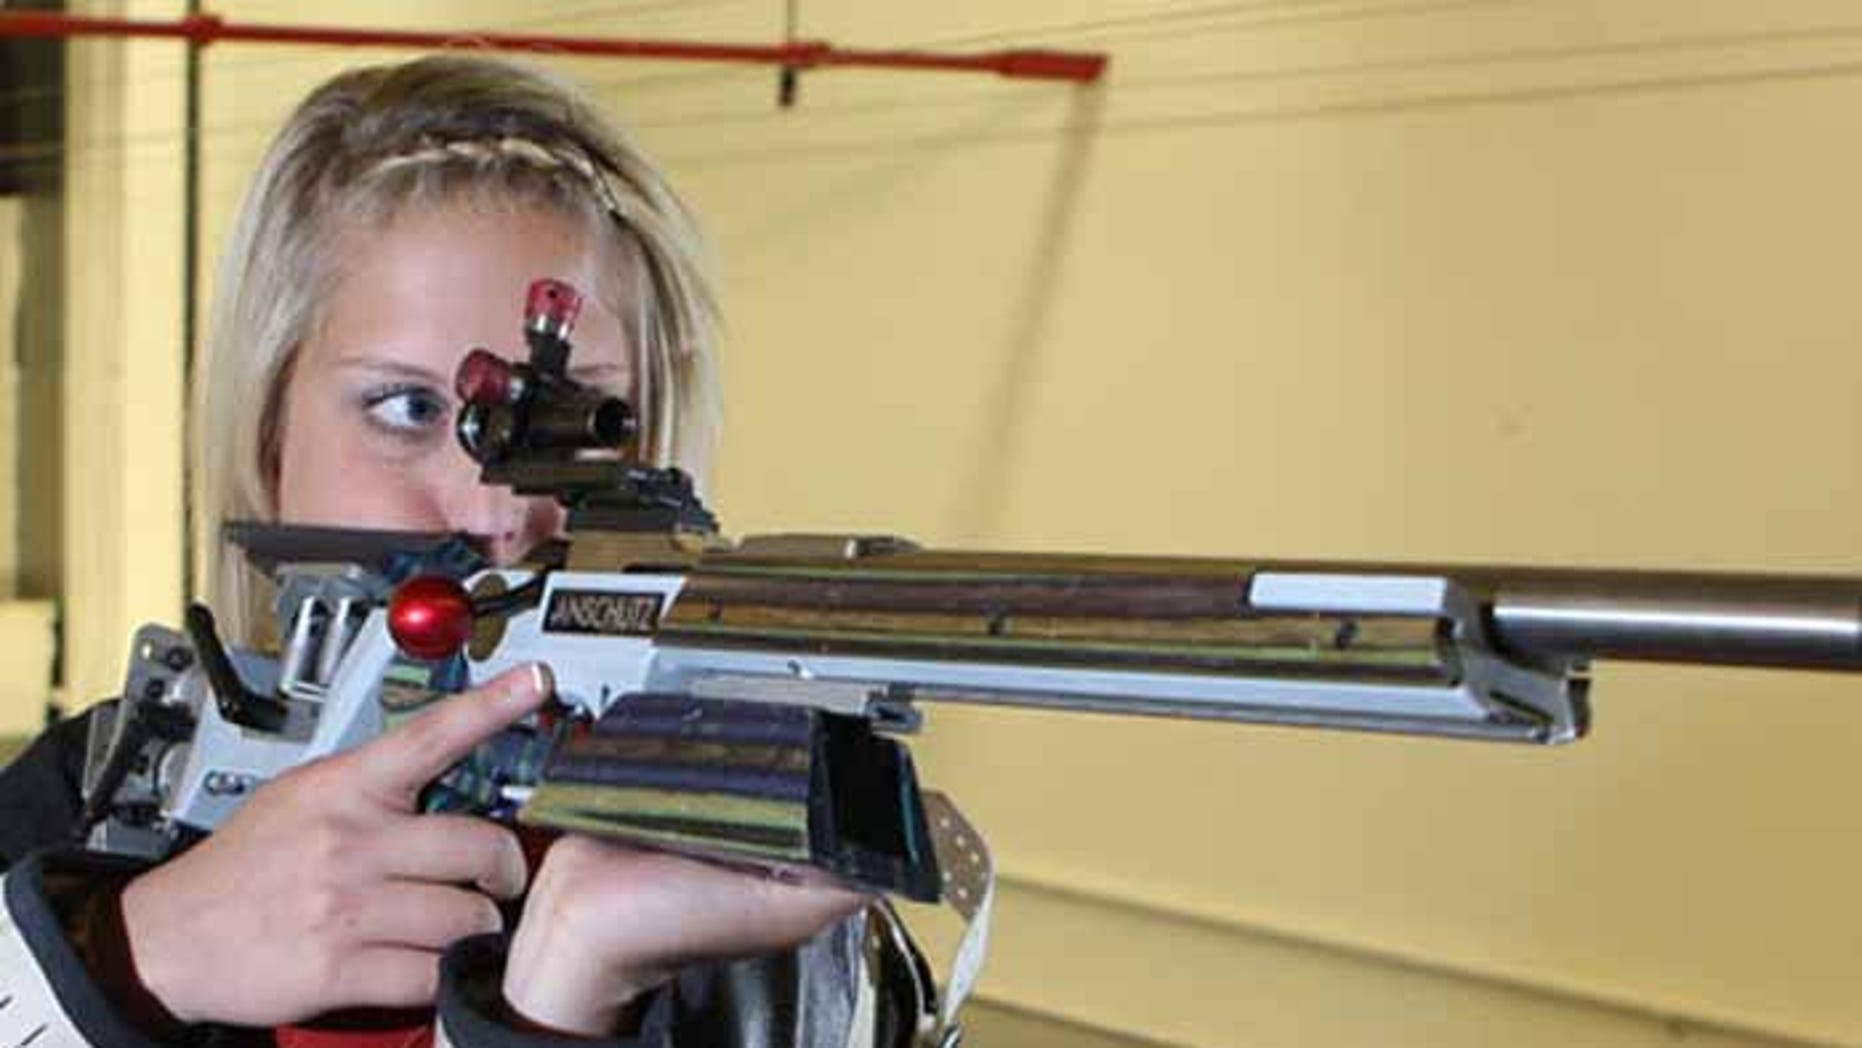 Rifle shooting is an important sport in Nebraska, as former University of Nebraska small-bore shooting star Katie Kostal demonstrates. (University of Nebraska)